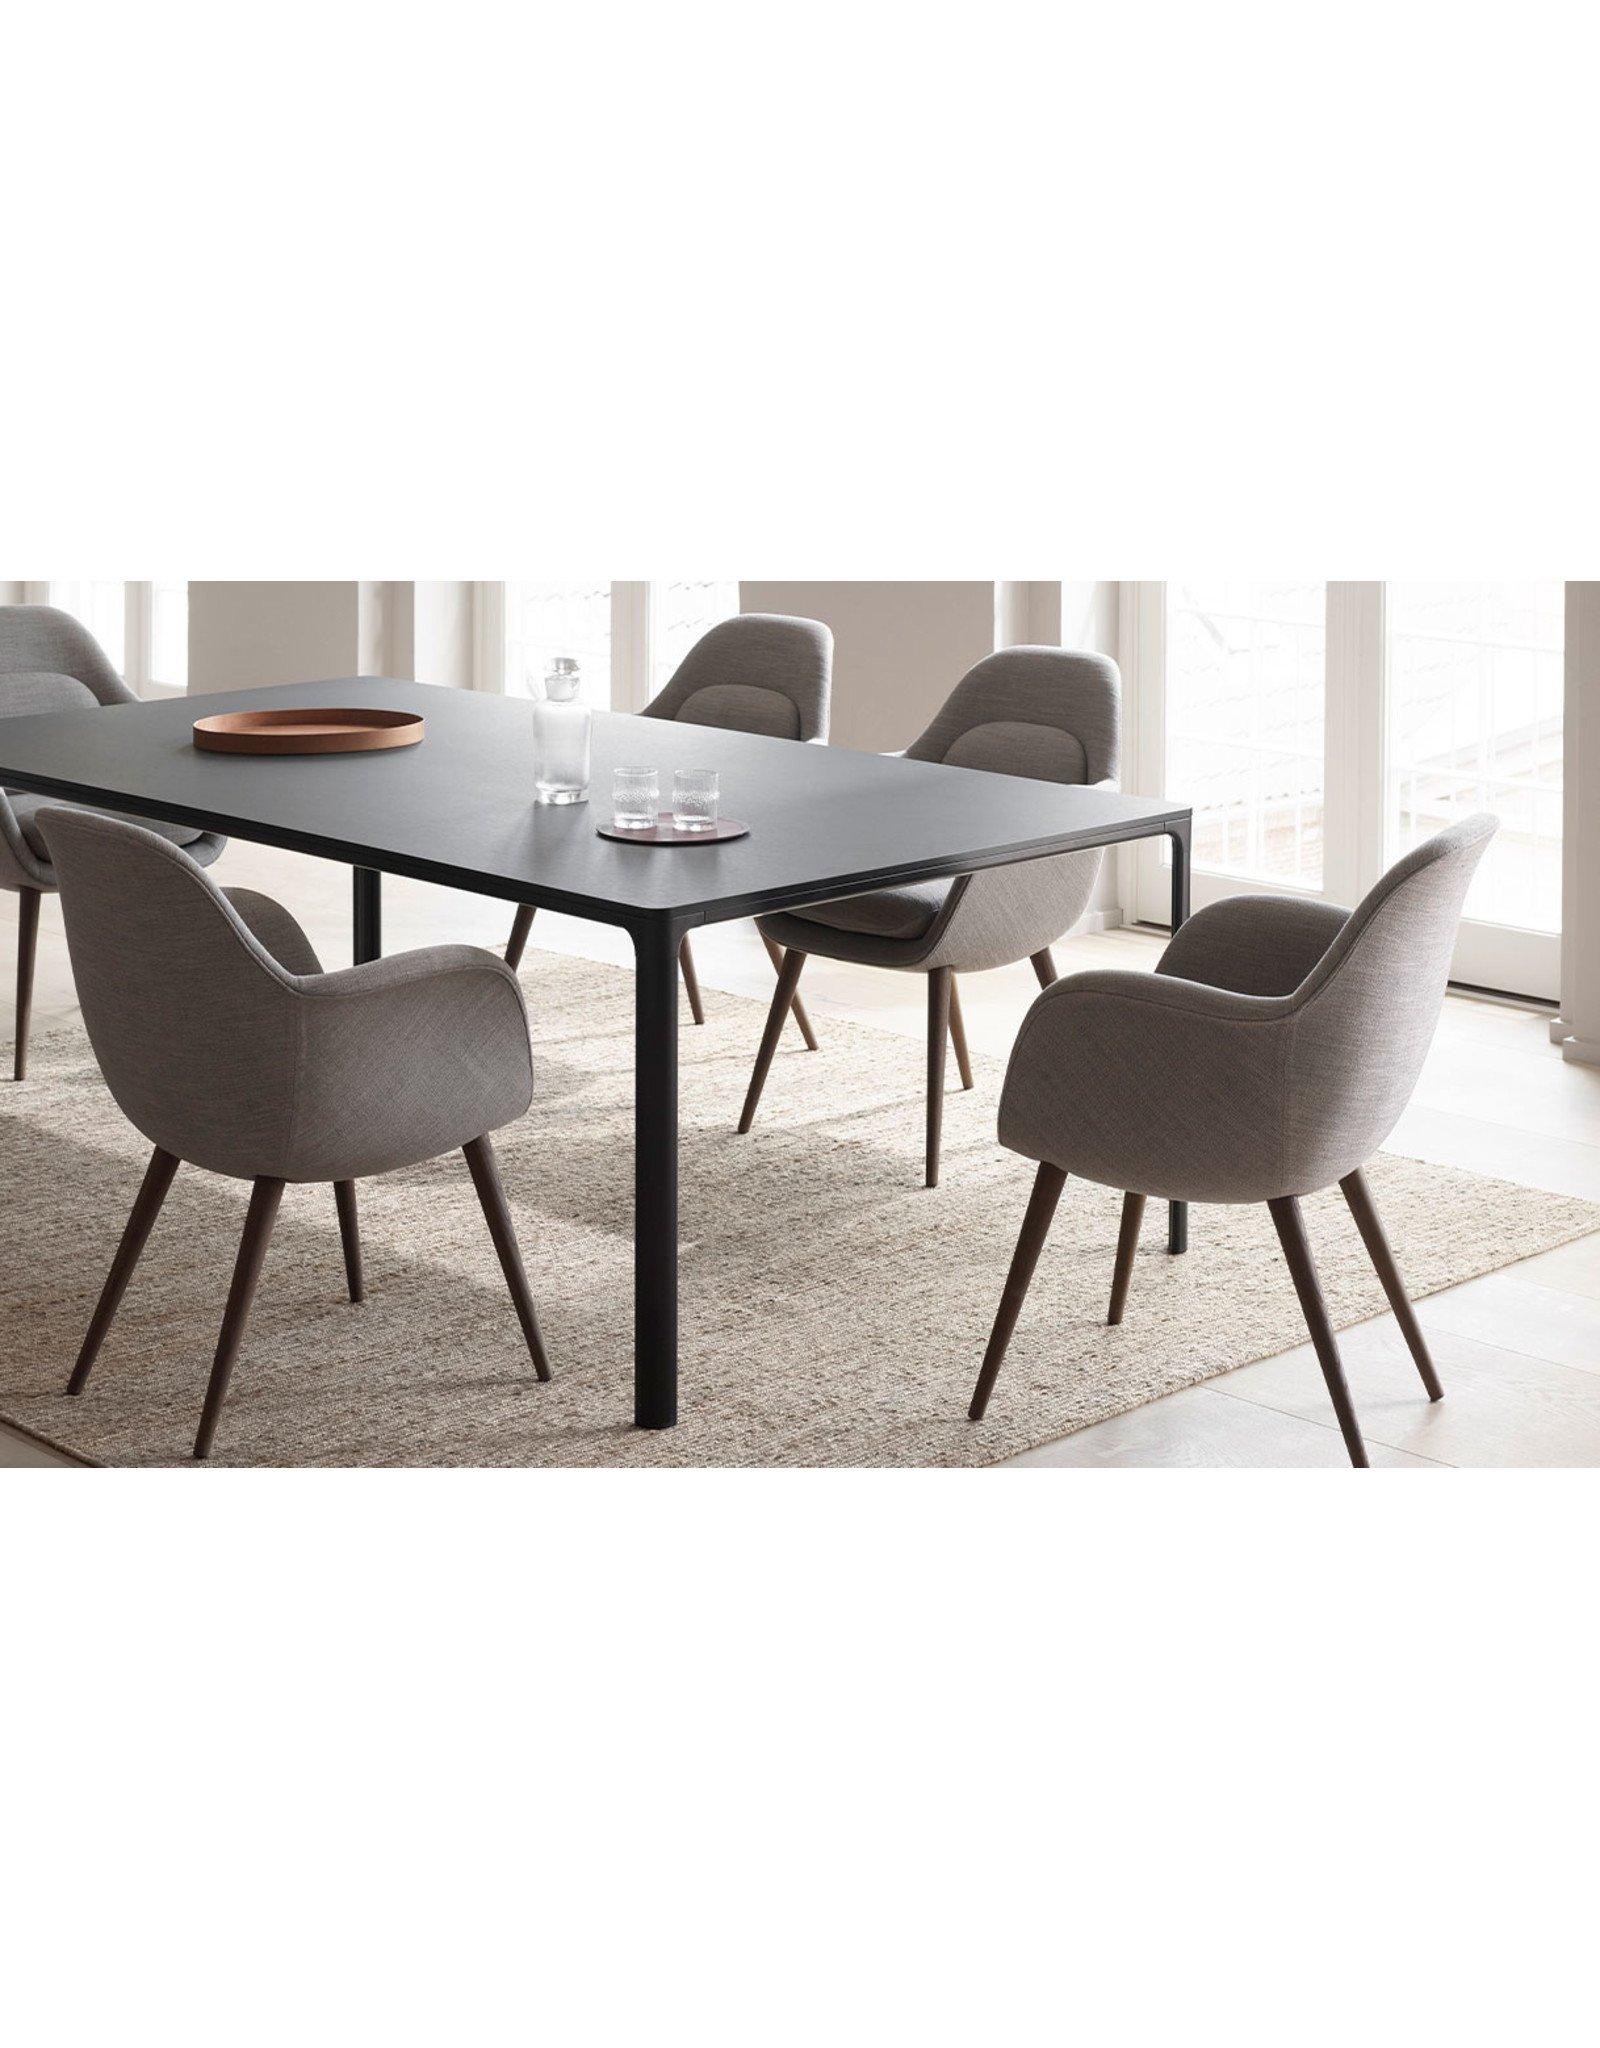 FREDERICIA 4623 MESA TABLE